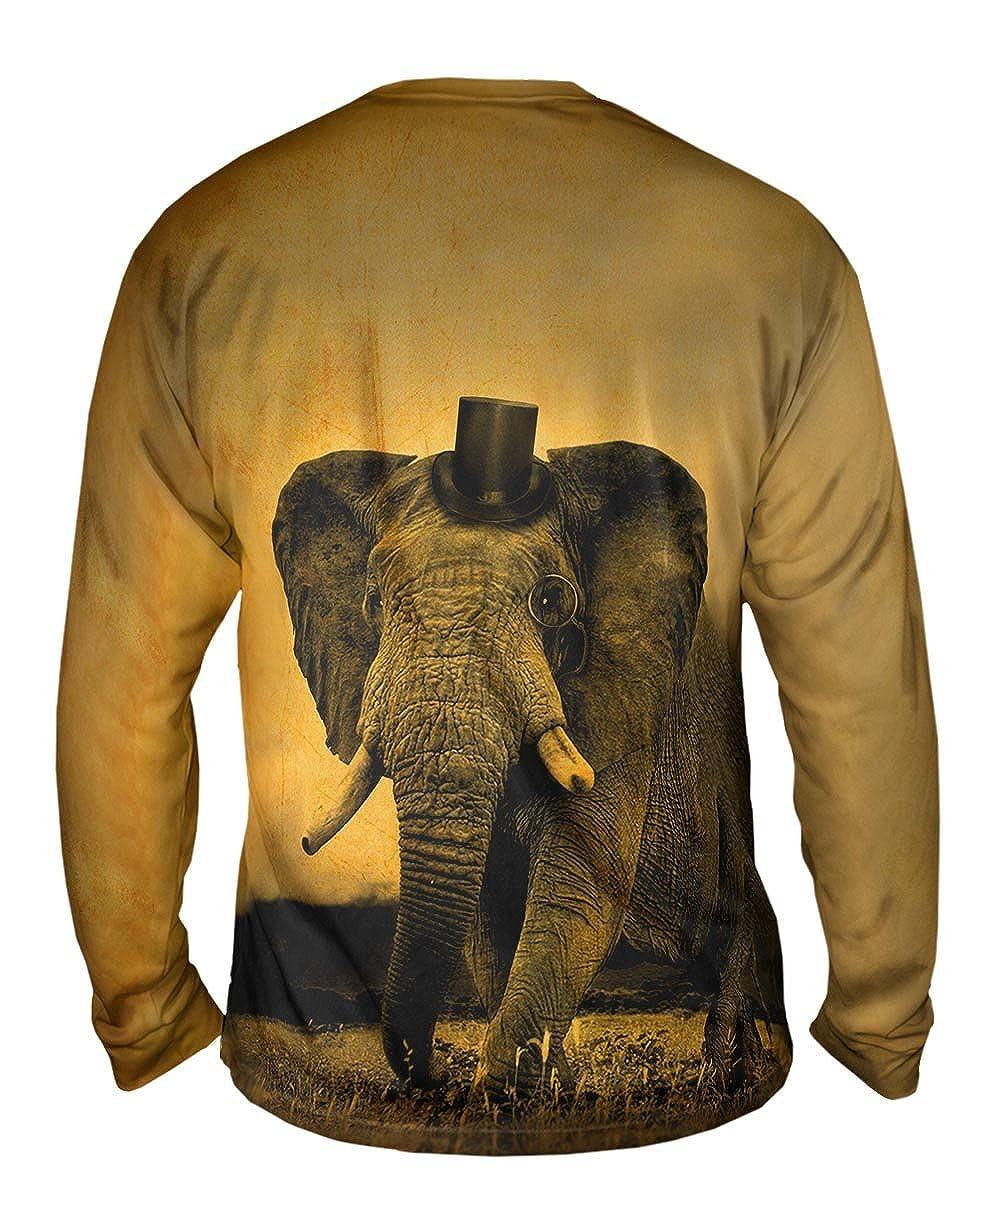 TShirt Mens Long Sleeve Yizzam Top Hat Elephant